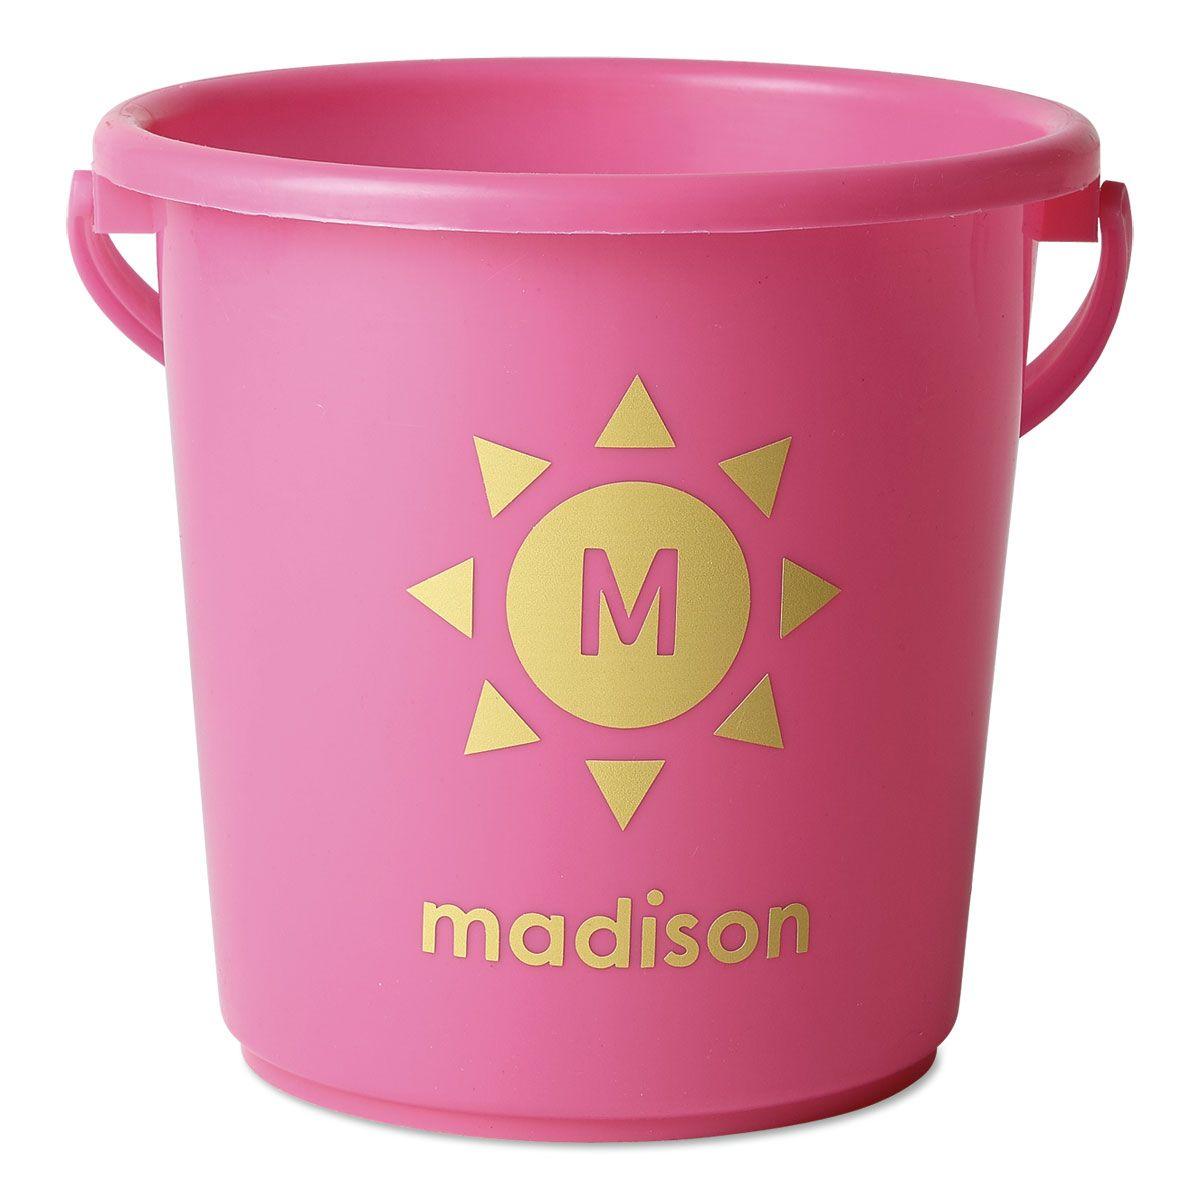 Personalized Beach Bucket-Pink-816451B